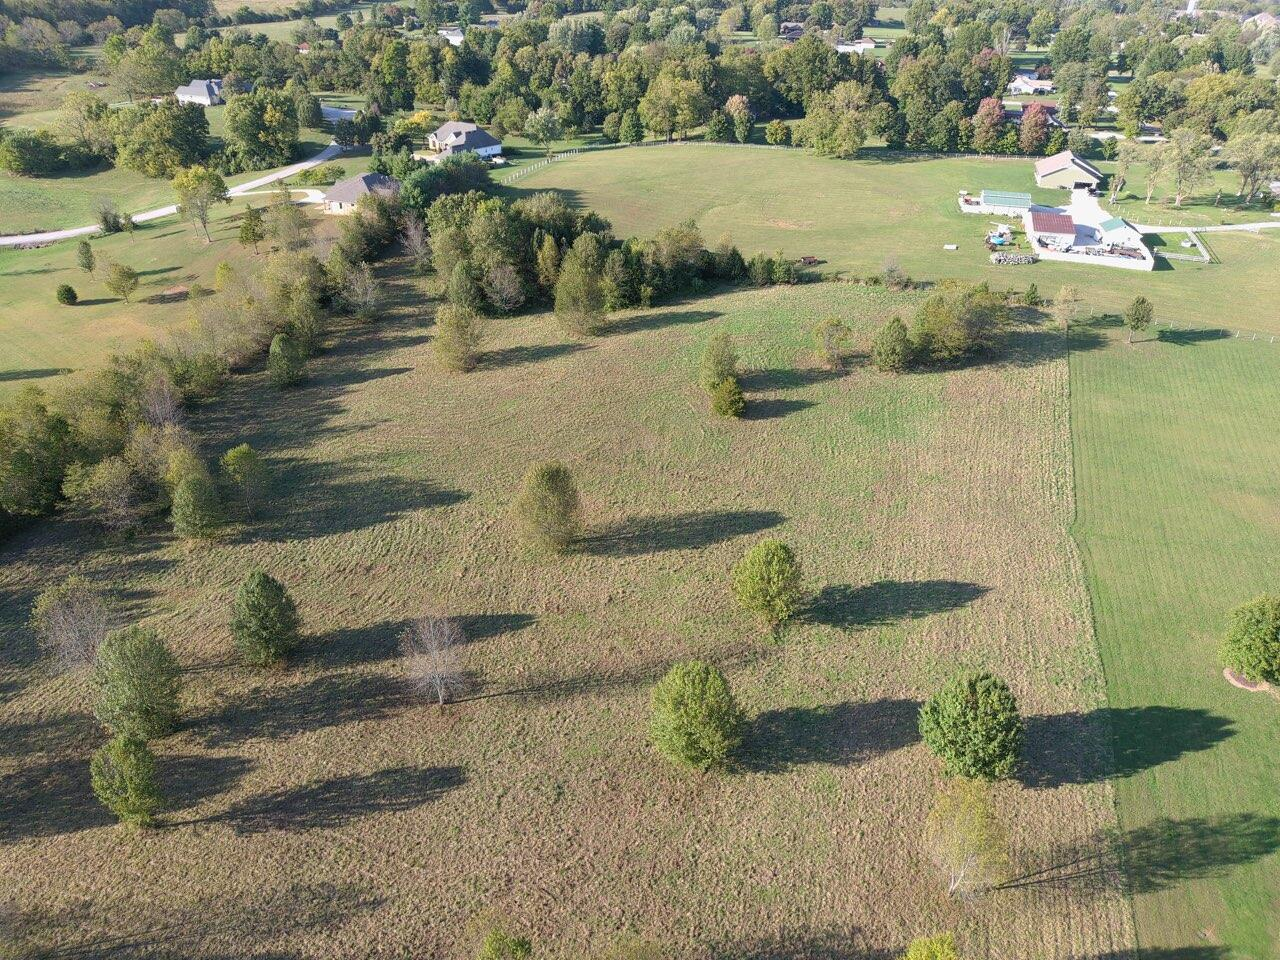 000 West Hickory Ridge Dr Nixa, MO 65714